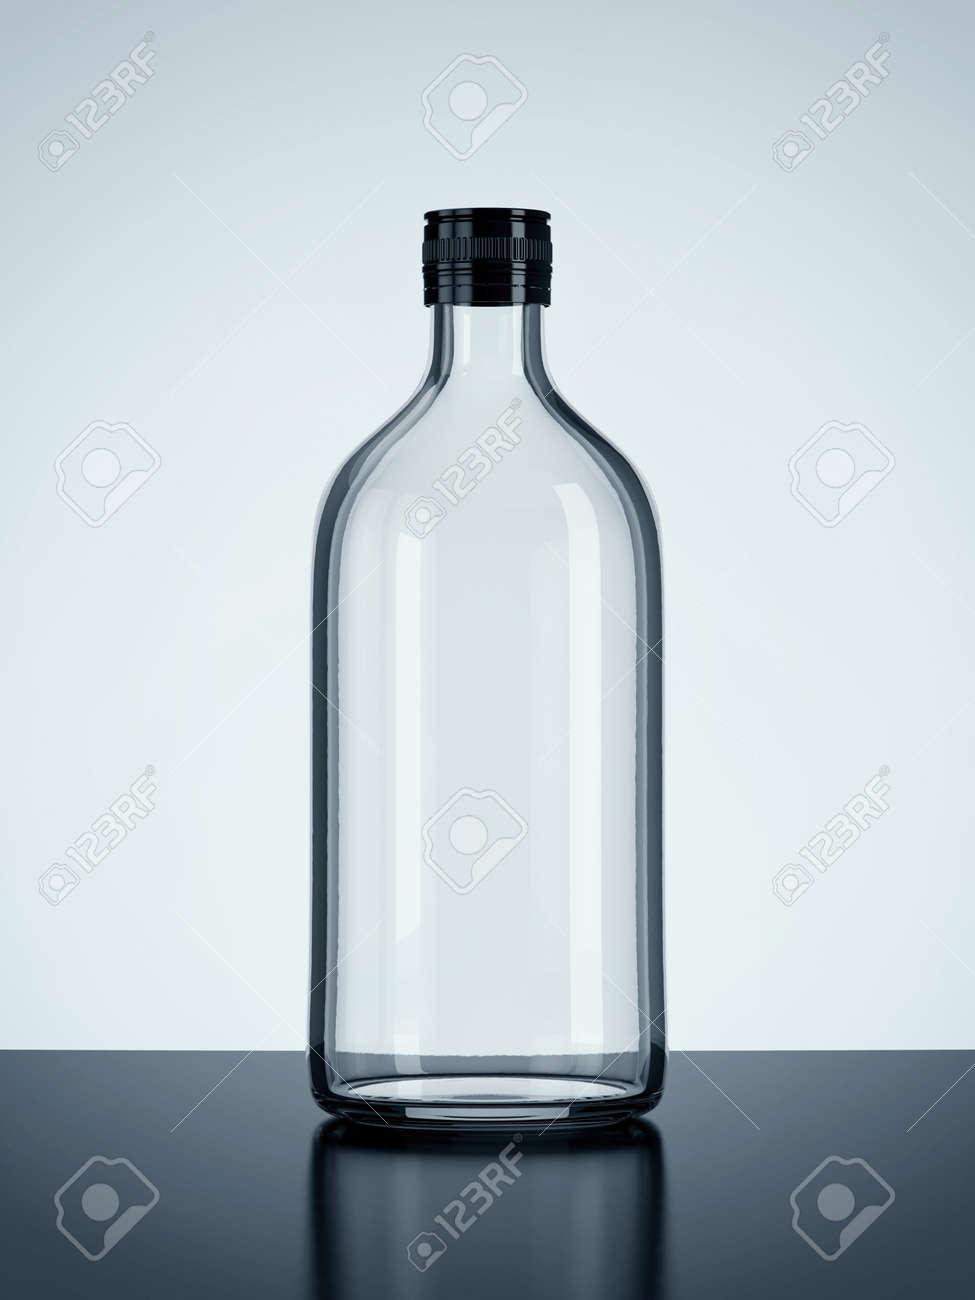 Bottle on floor - 32423647